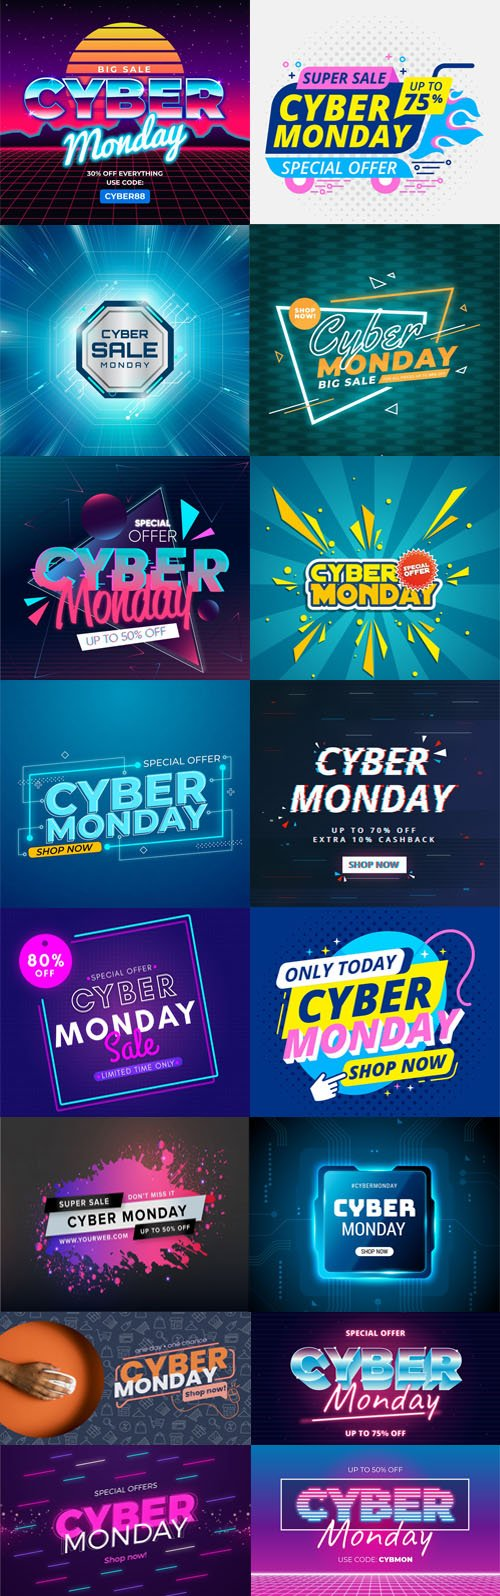 Cyber Monday Concept Flat Designs Vector Templates